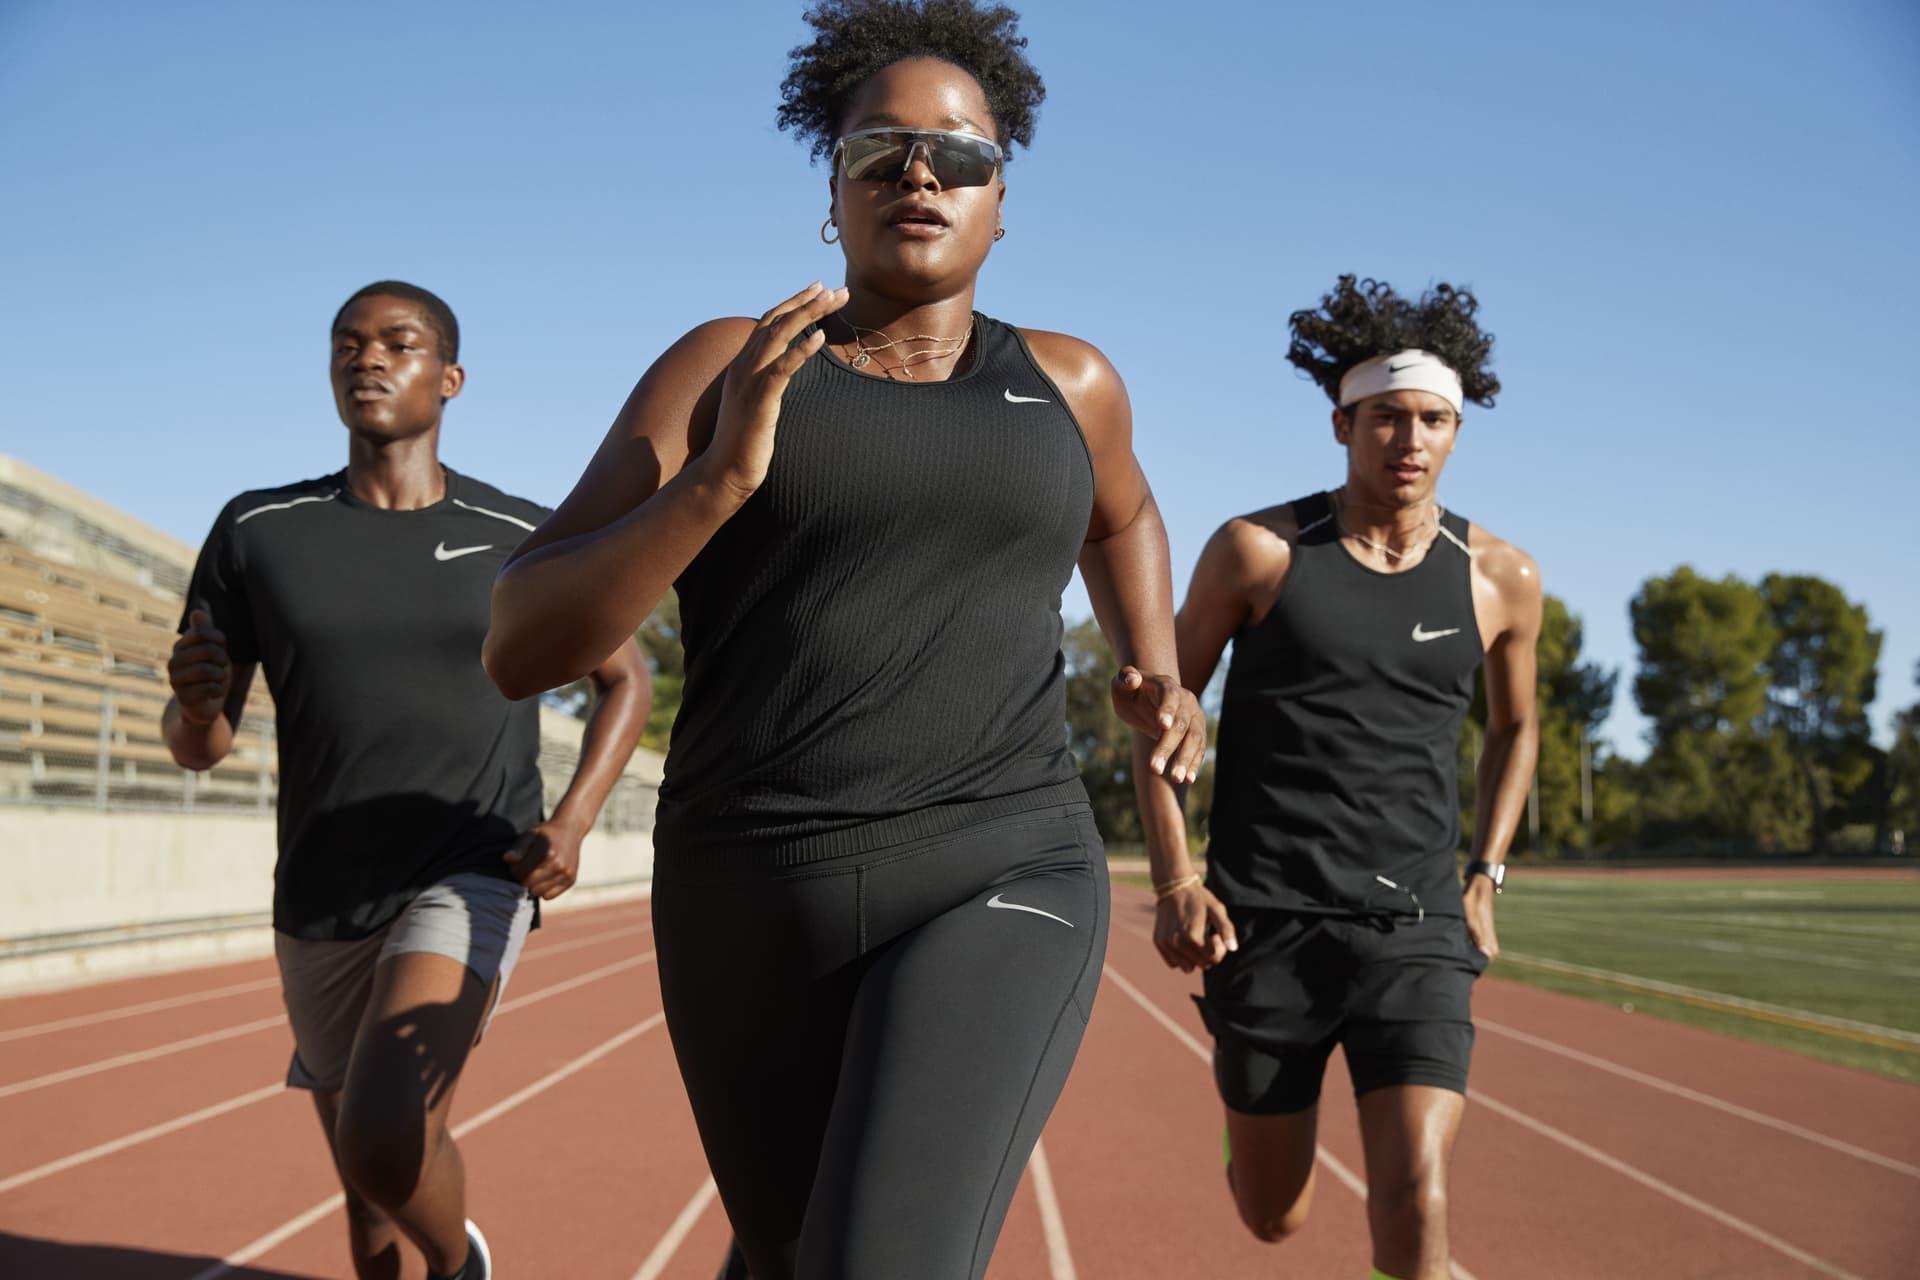 Hablar con esposas perspectiva  How Do I Use Nike Run Club to Track Speed Runs? | Nike Help